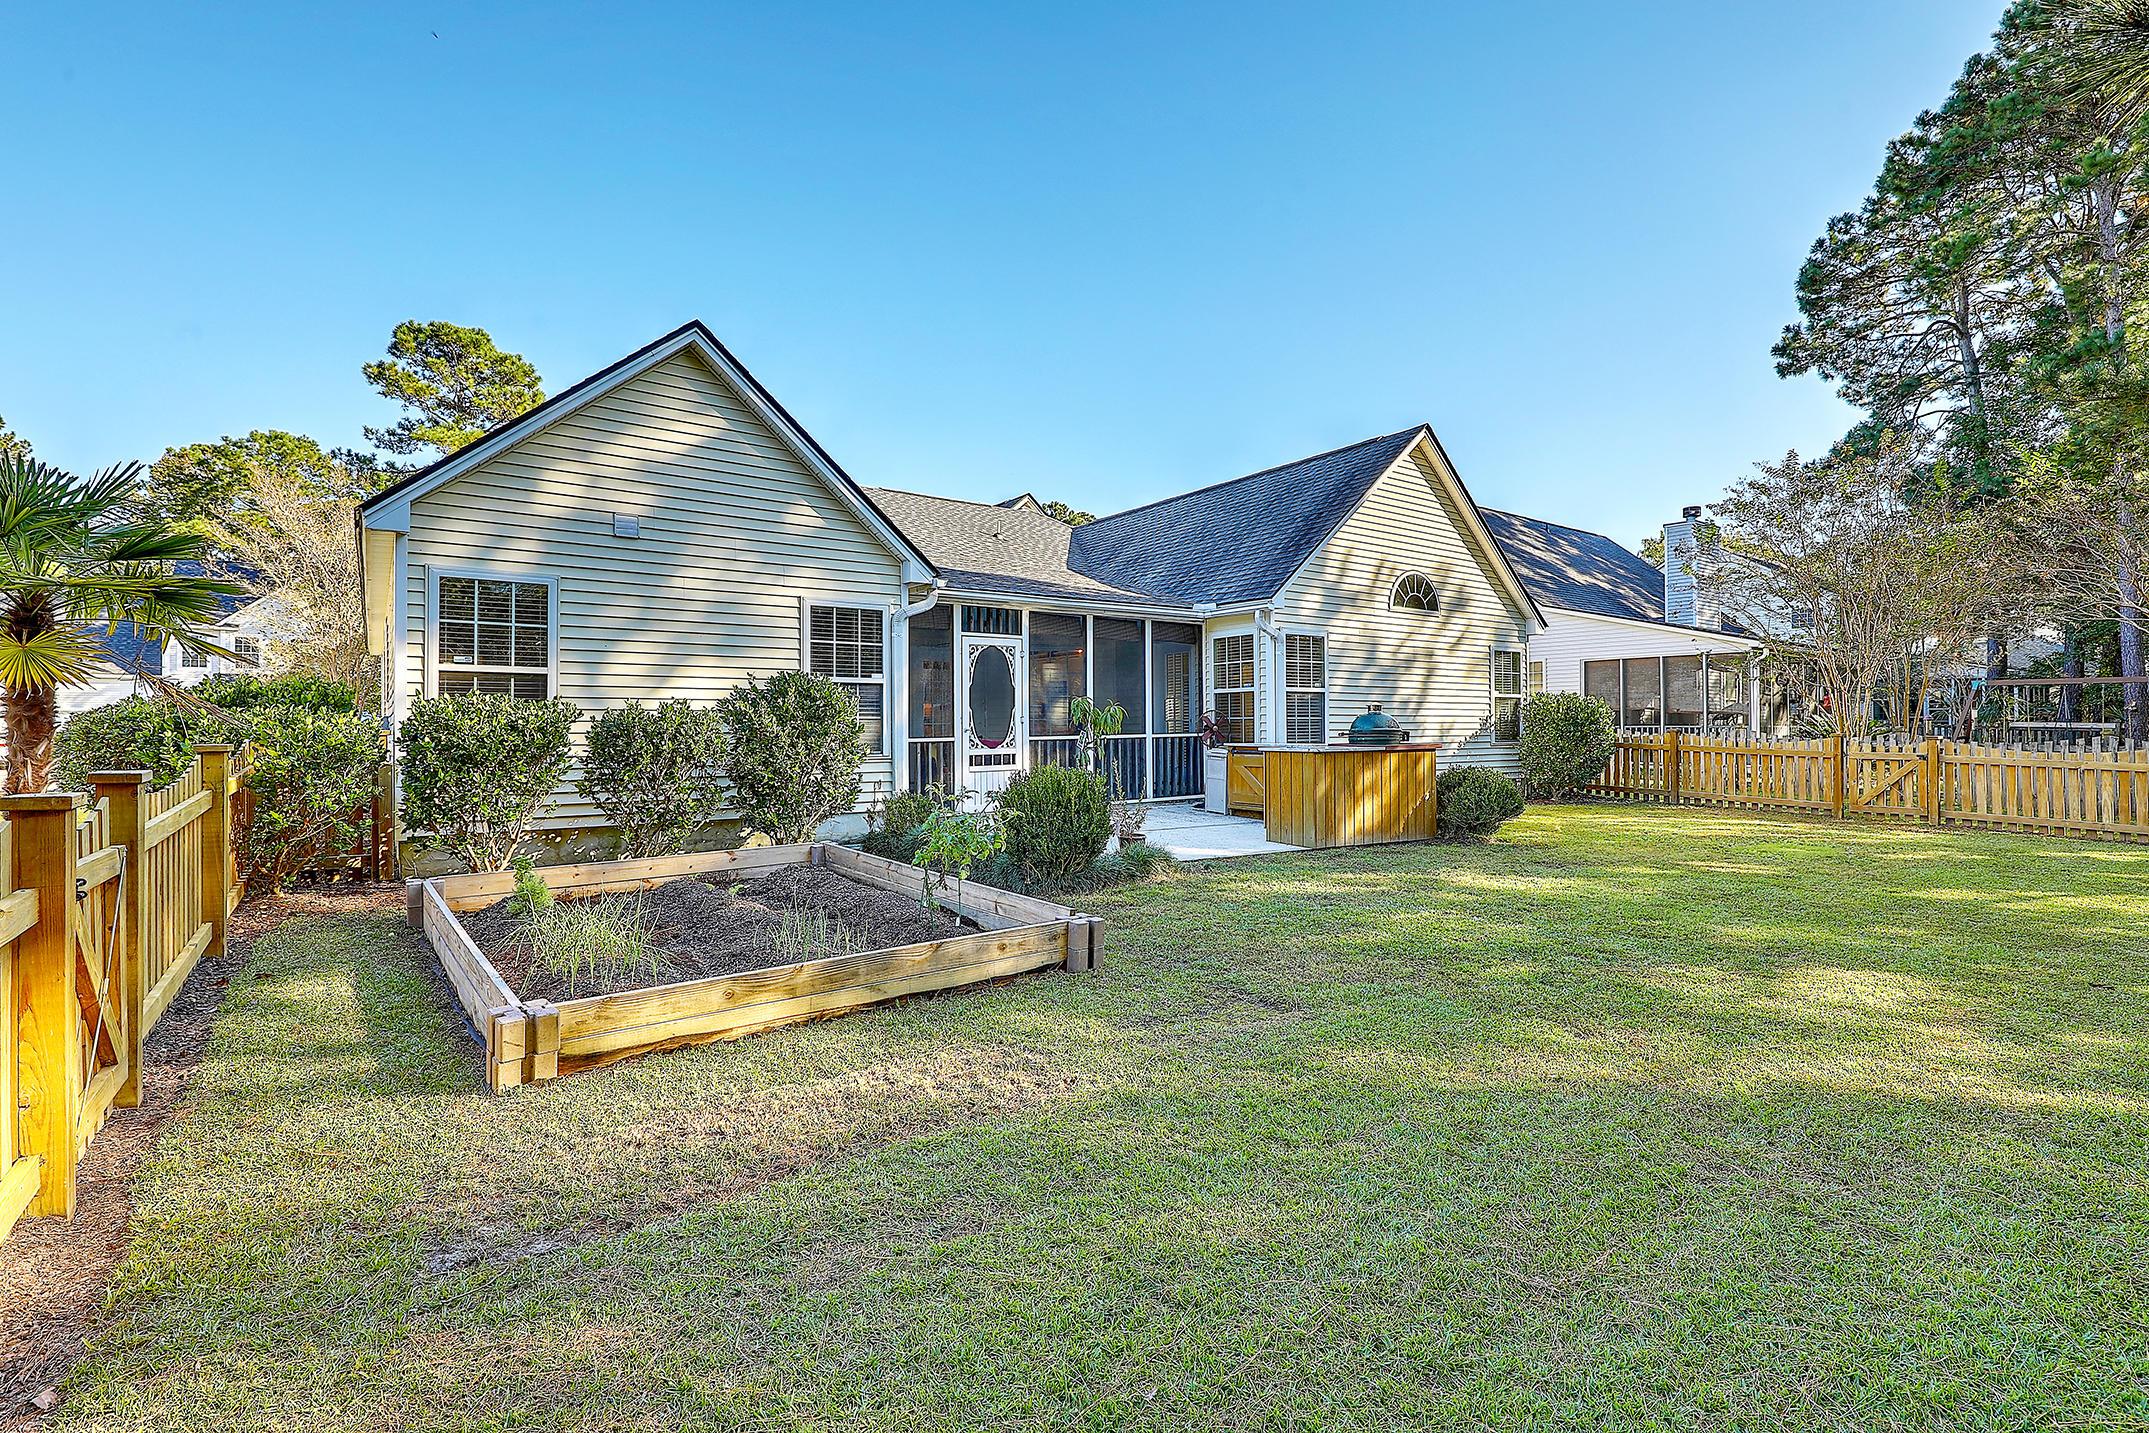 Dunes West Homes For Sale - 1471 Cypress Pointe, Mount Pleasant, SC - 18